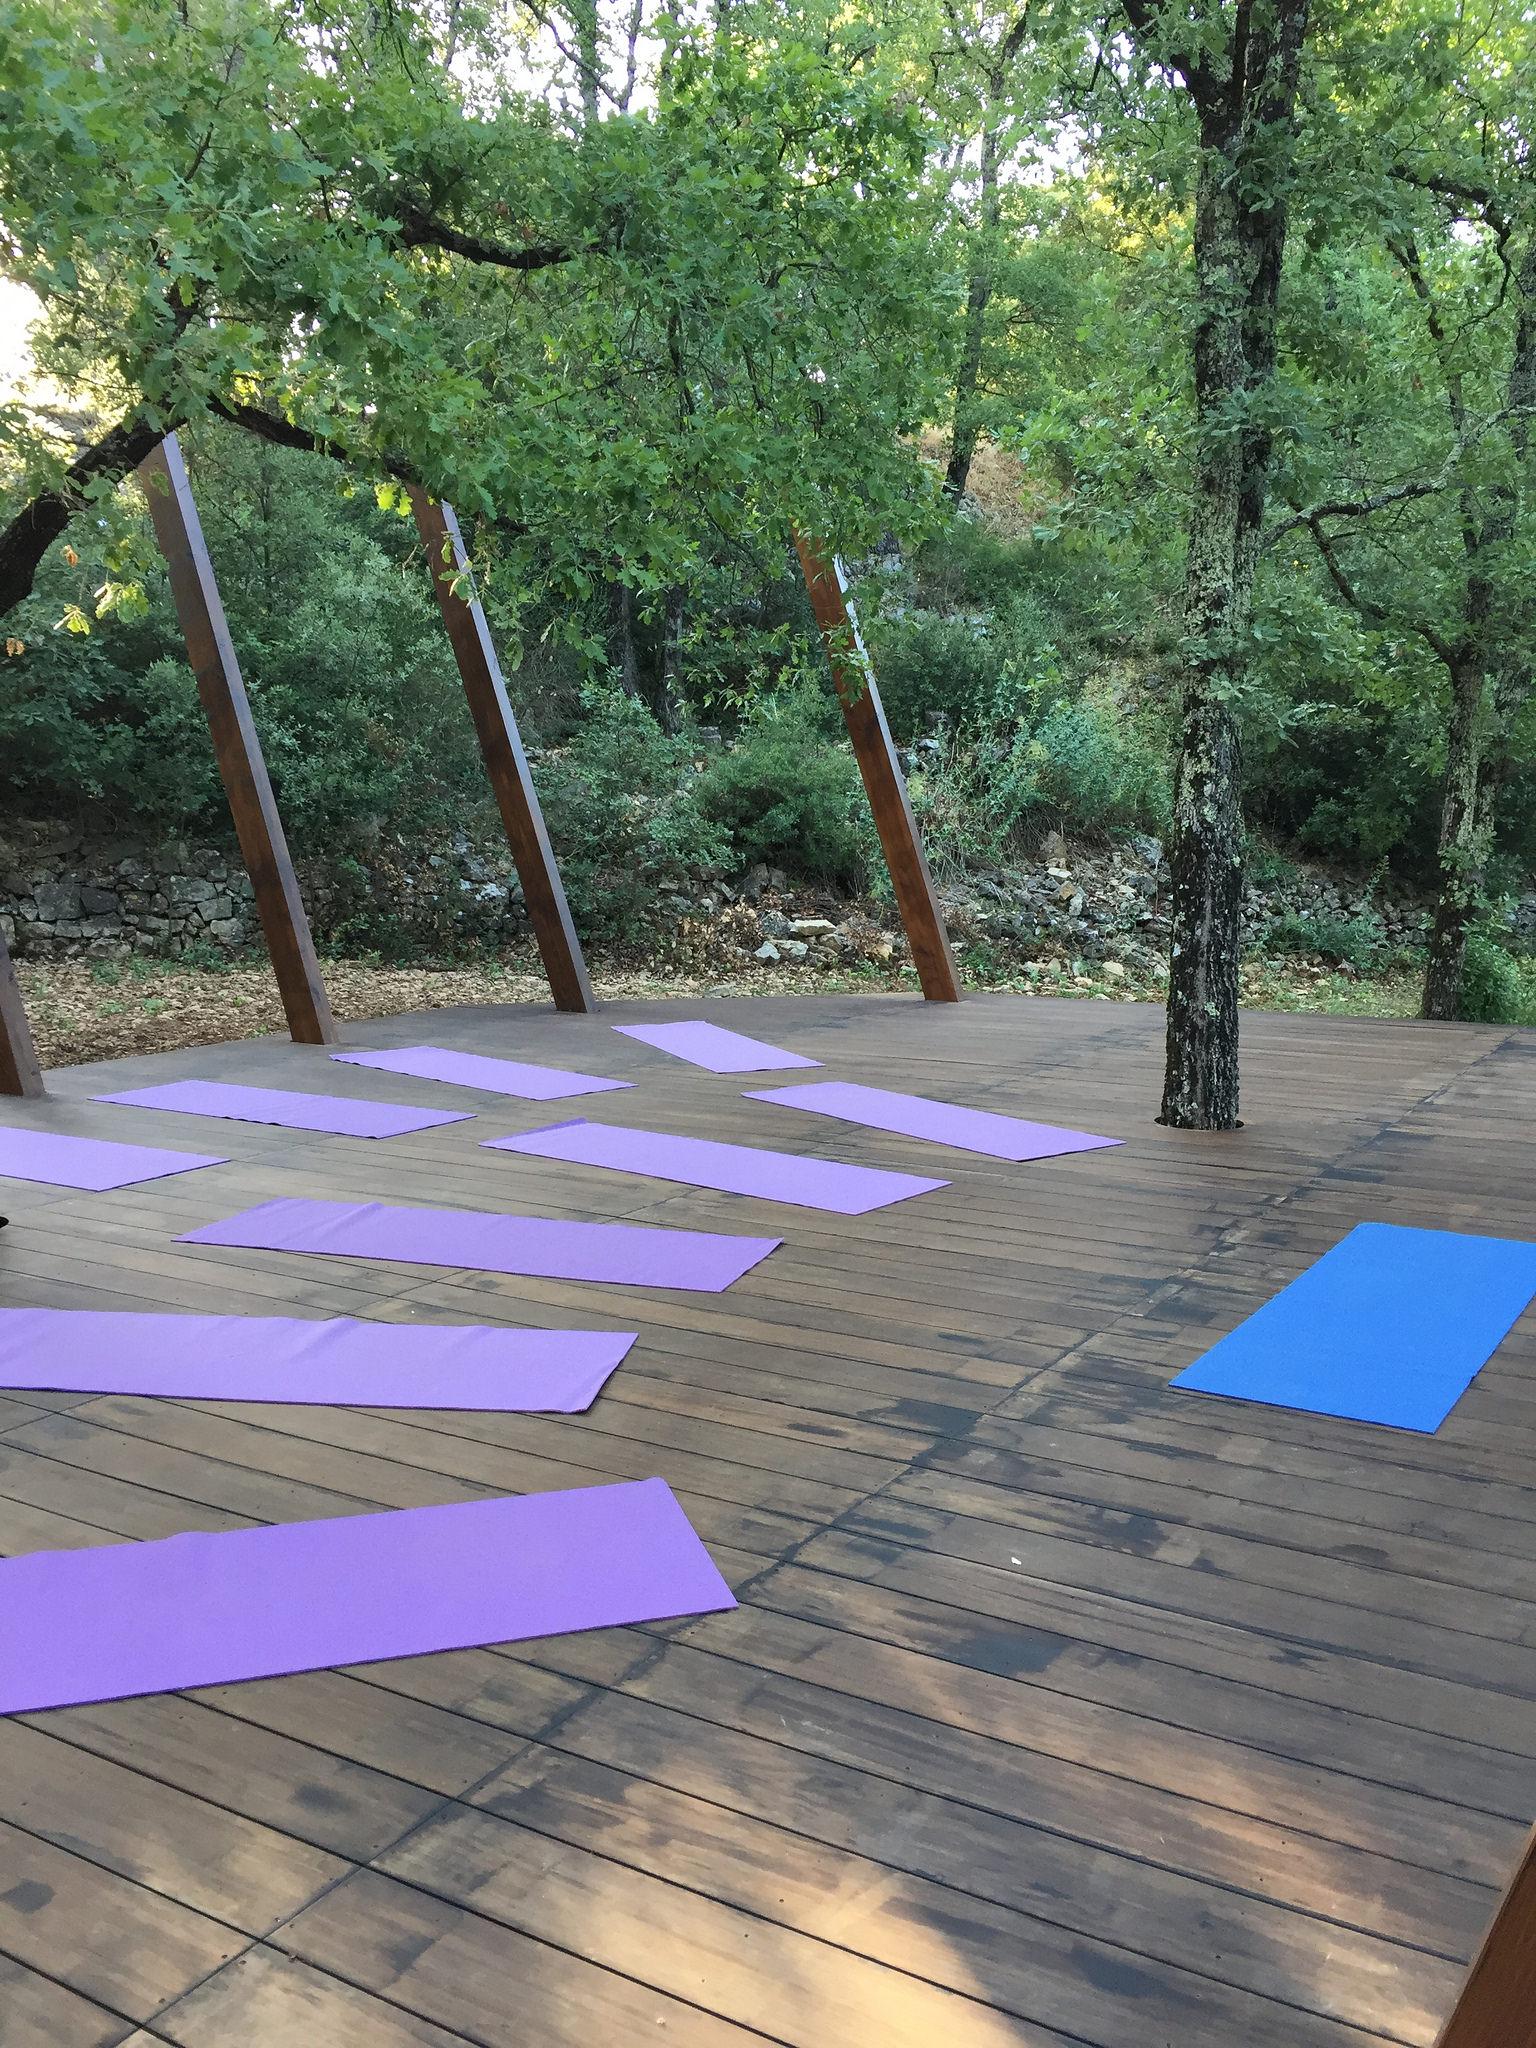 Yoga on the deck amongst the trees EAT.PRAY.MOVE Yoga Retreats | Provence, France